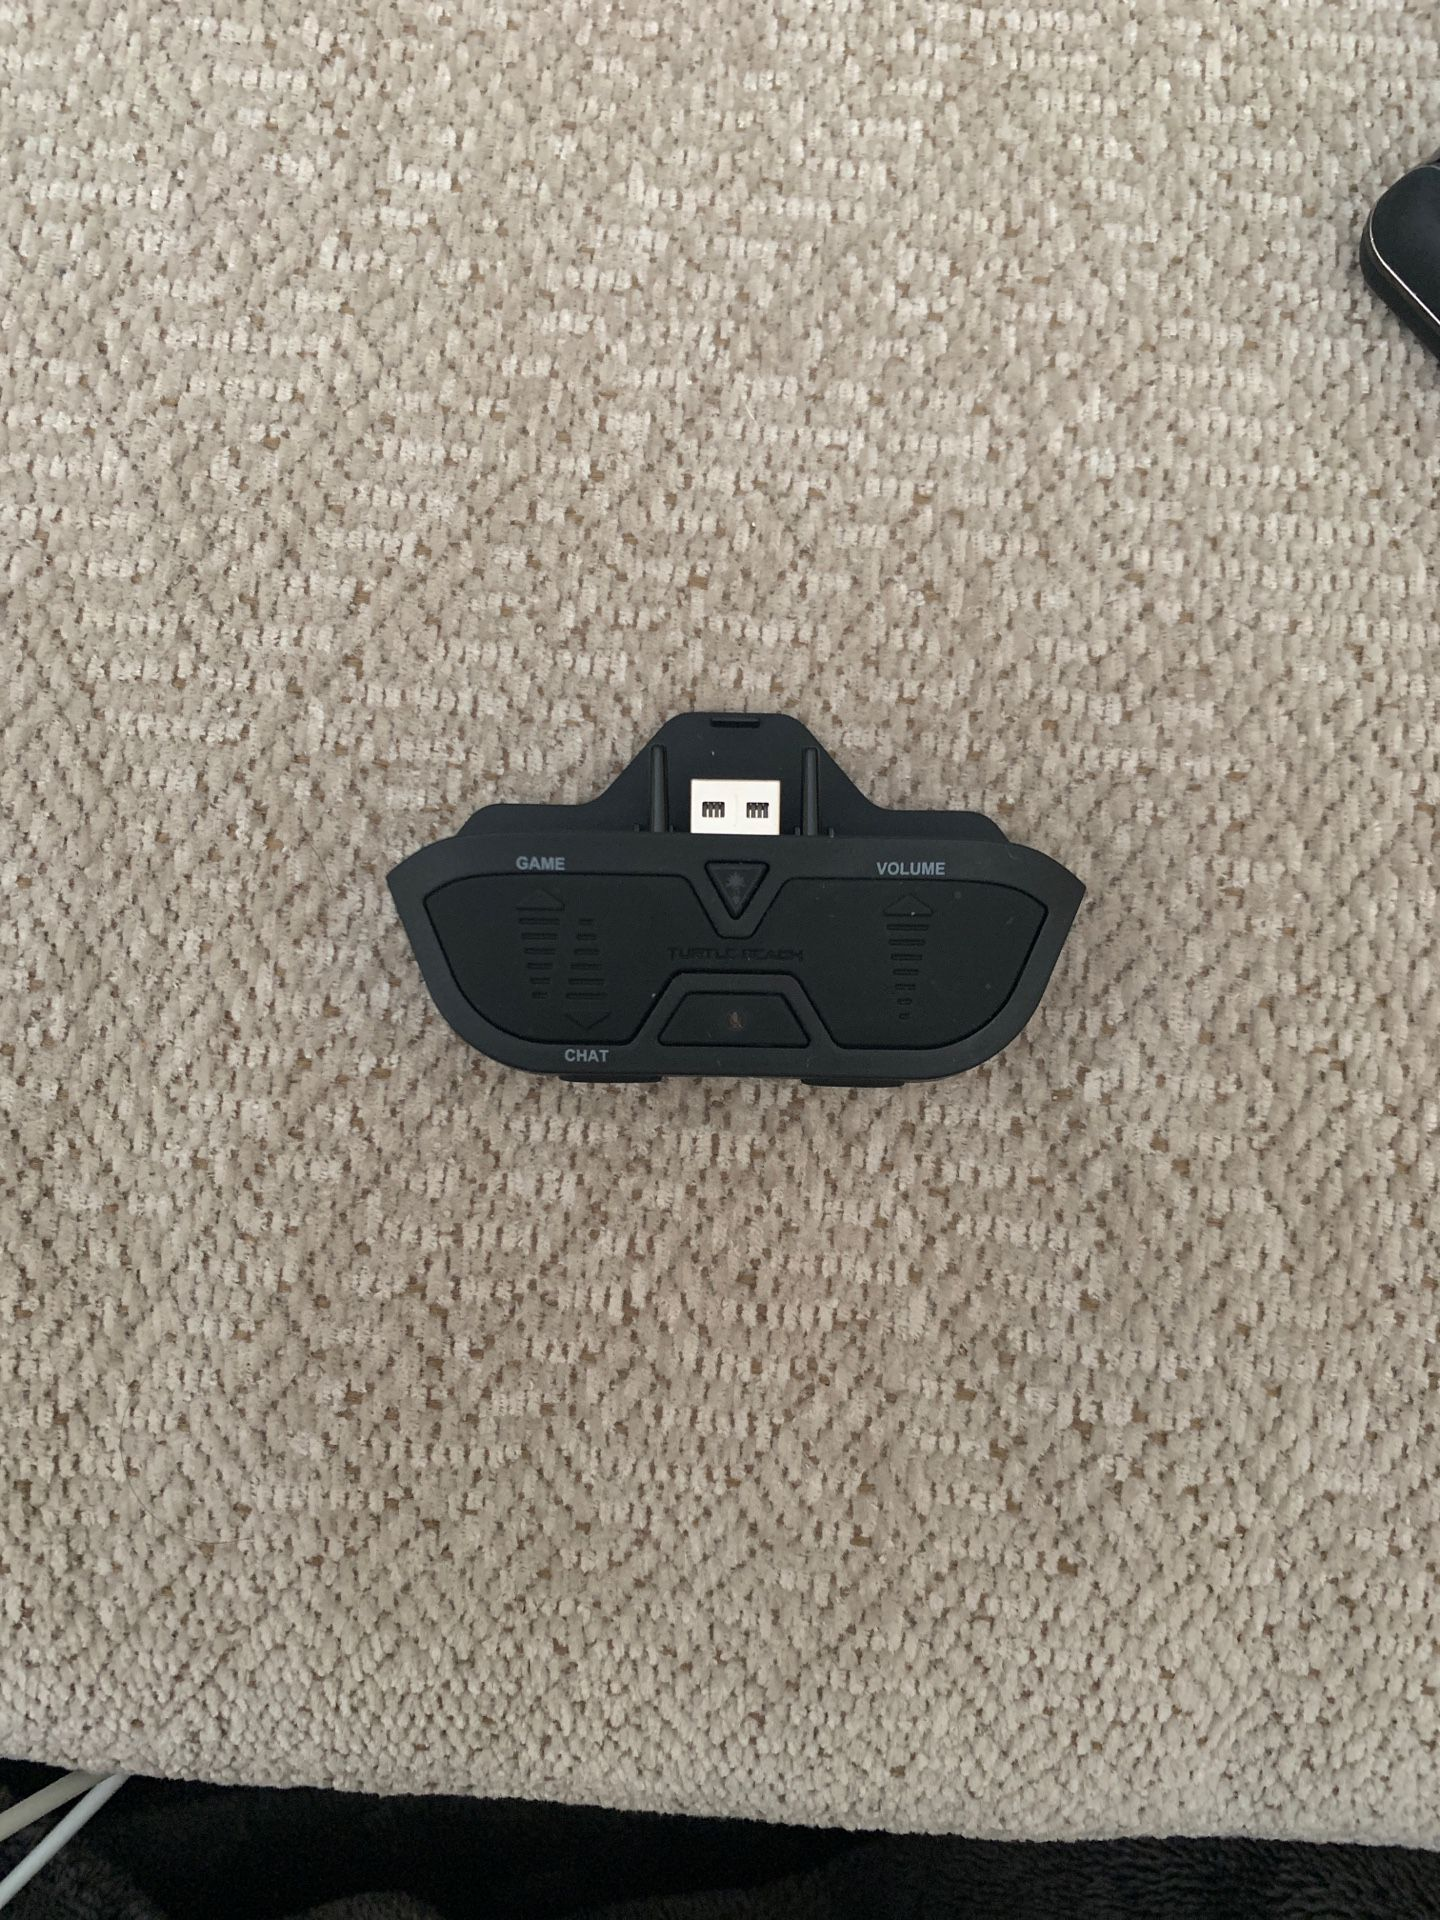 Xbox One Turtle Beach headset adapter